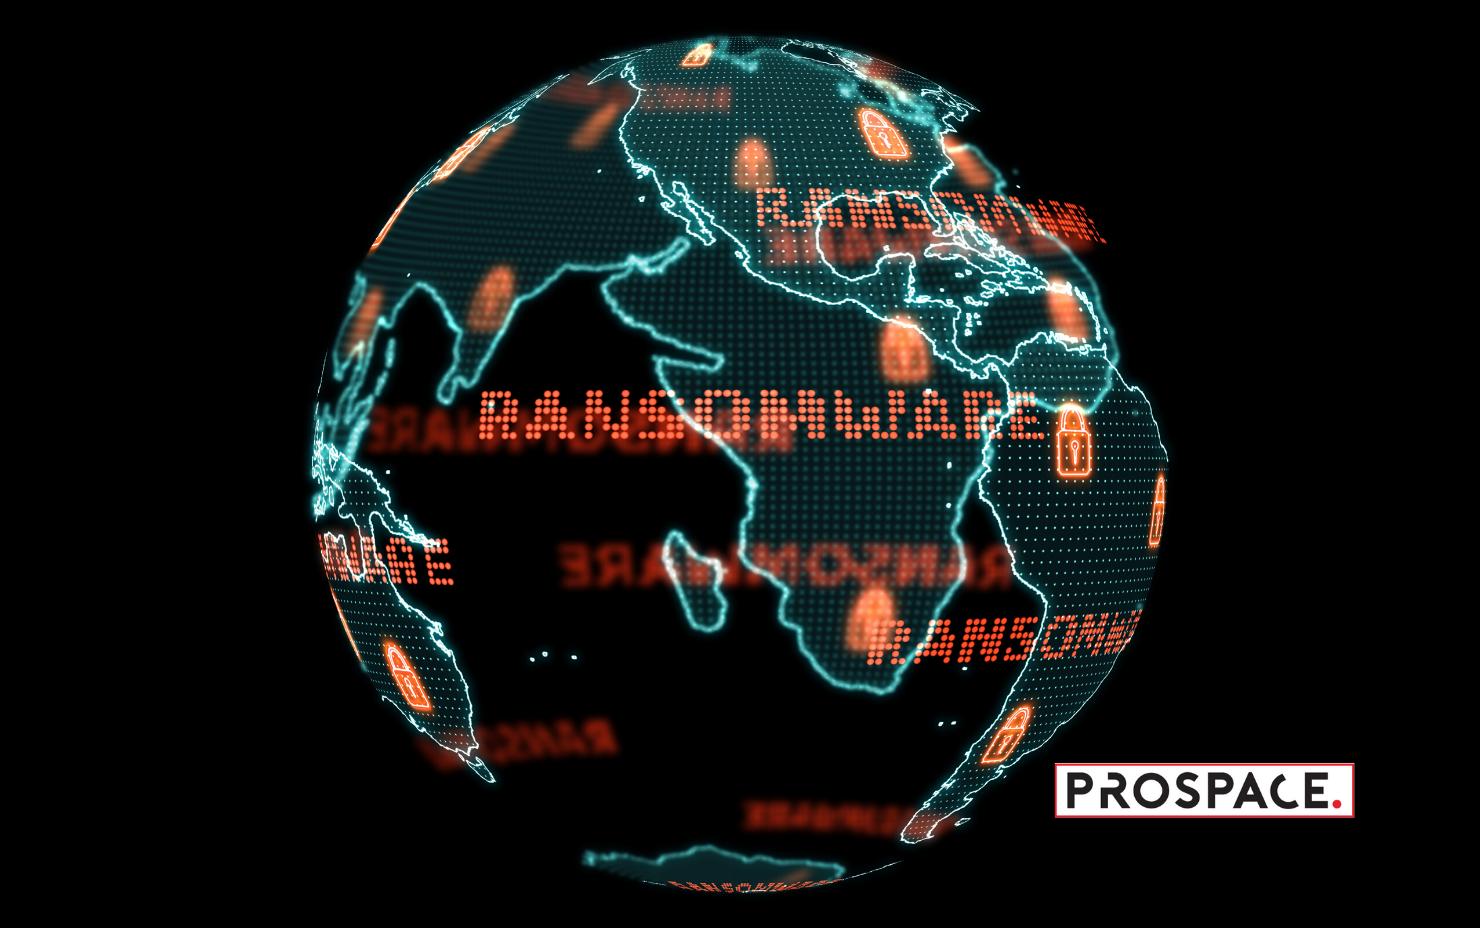 Cloudflare เผย Ransomware โจมตีมากขึ้นอย่างที่ไม่เคยเกิดขึ้นมาก่อน!